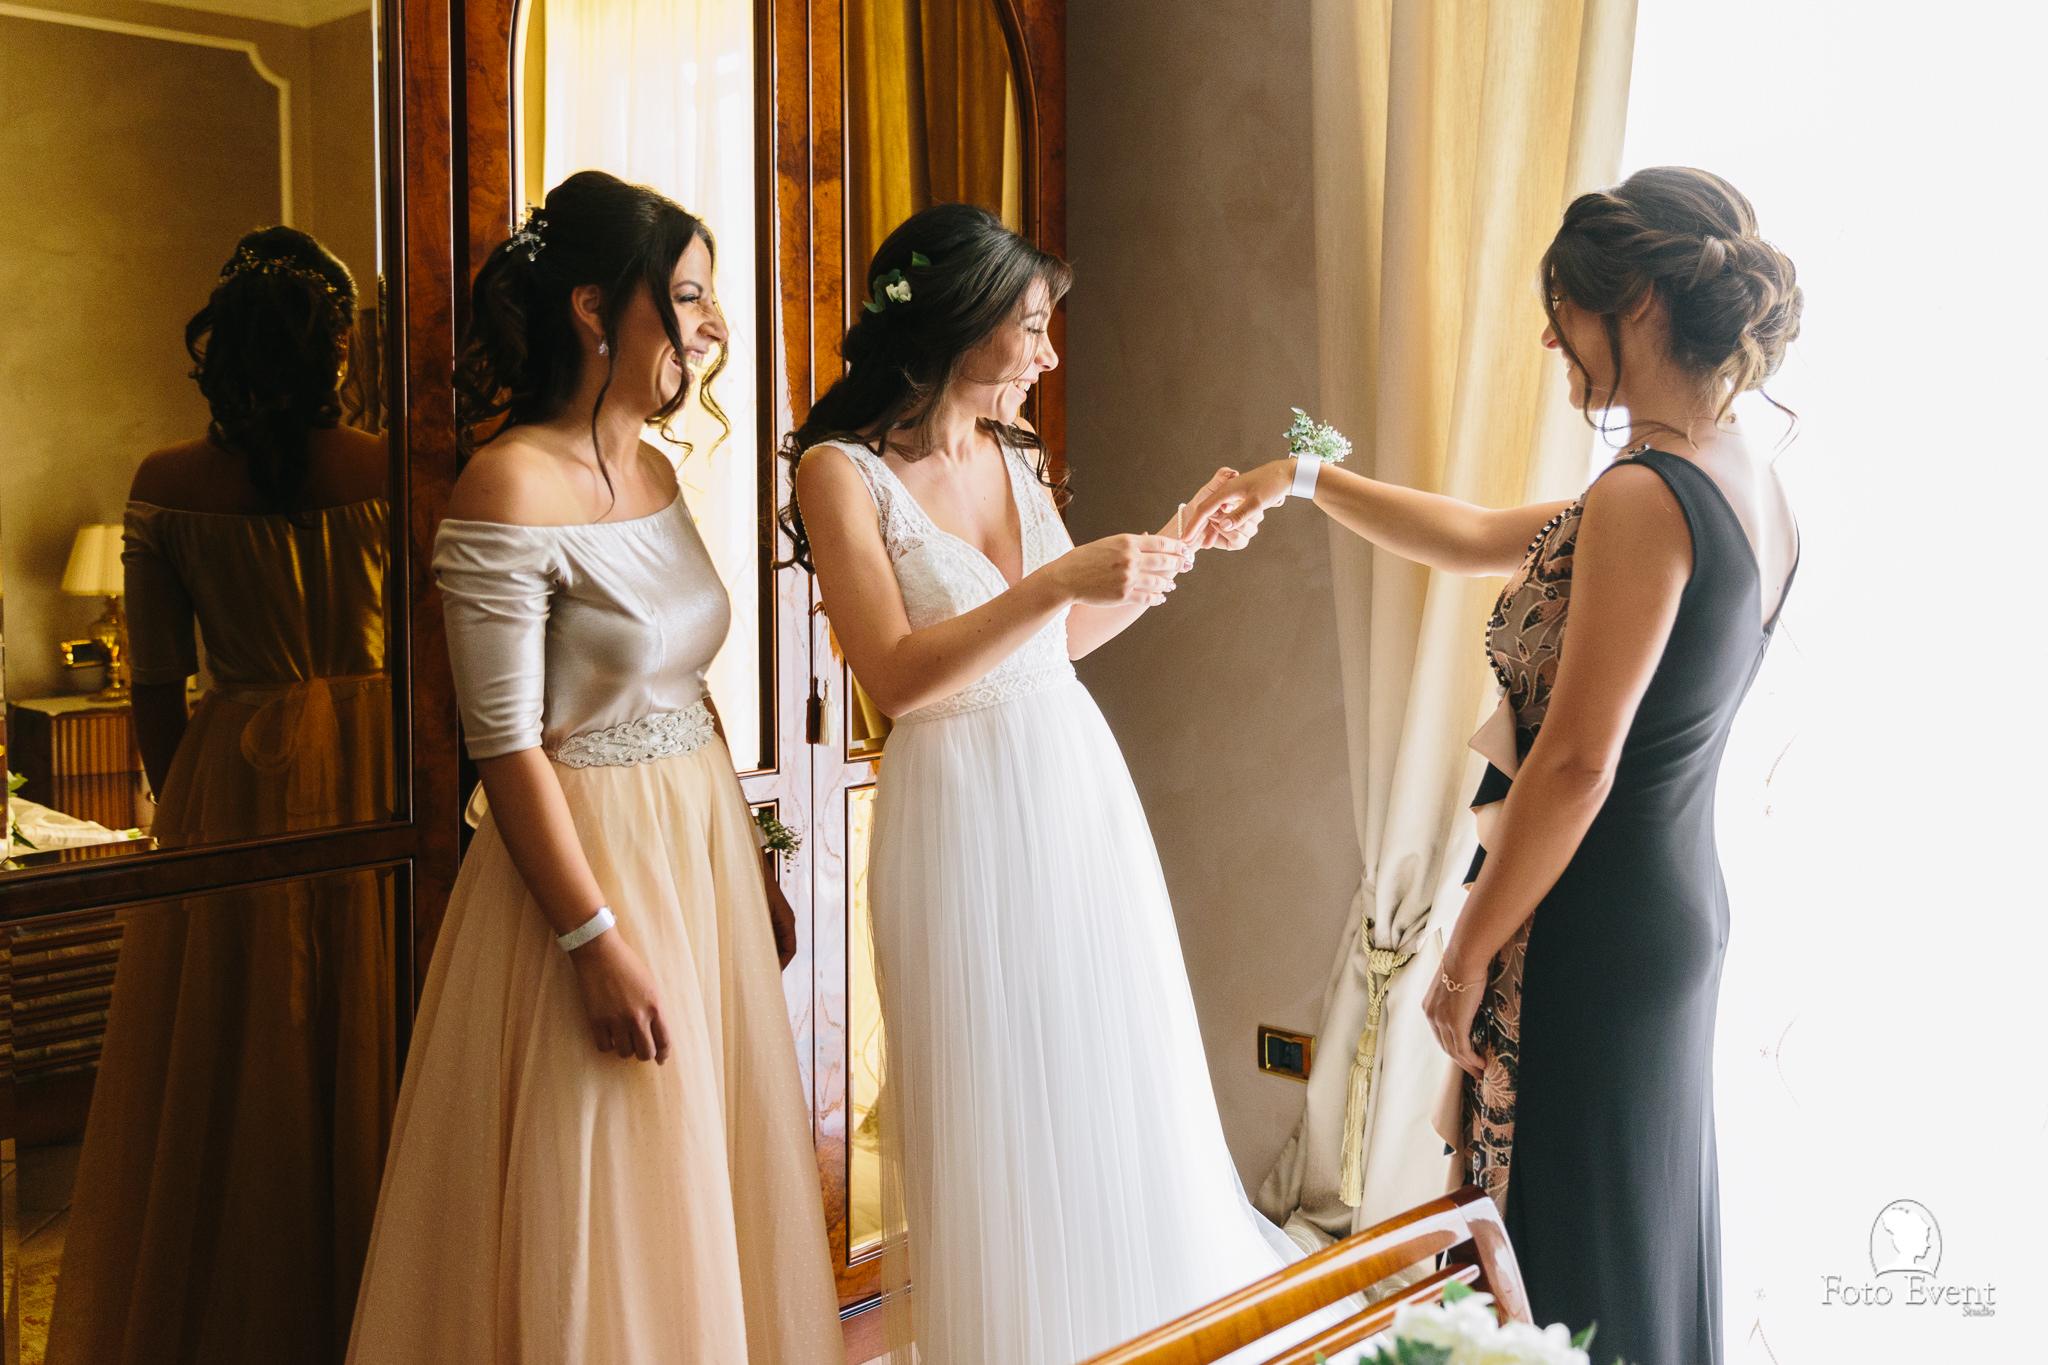 003-2019-08-23-Matrimonio-Lucia-e-Rosario-Scopelliti-5DE-921